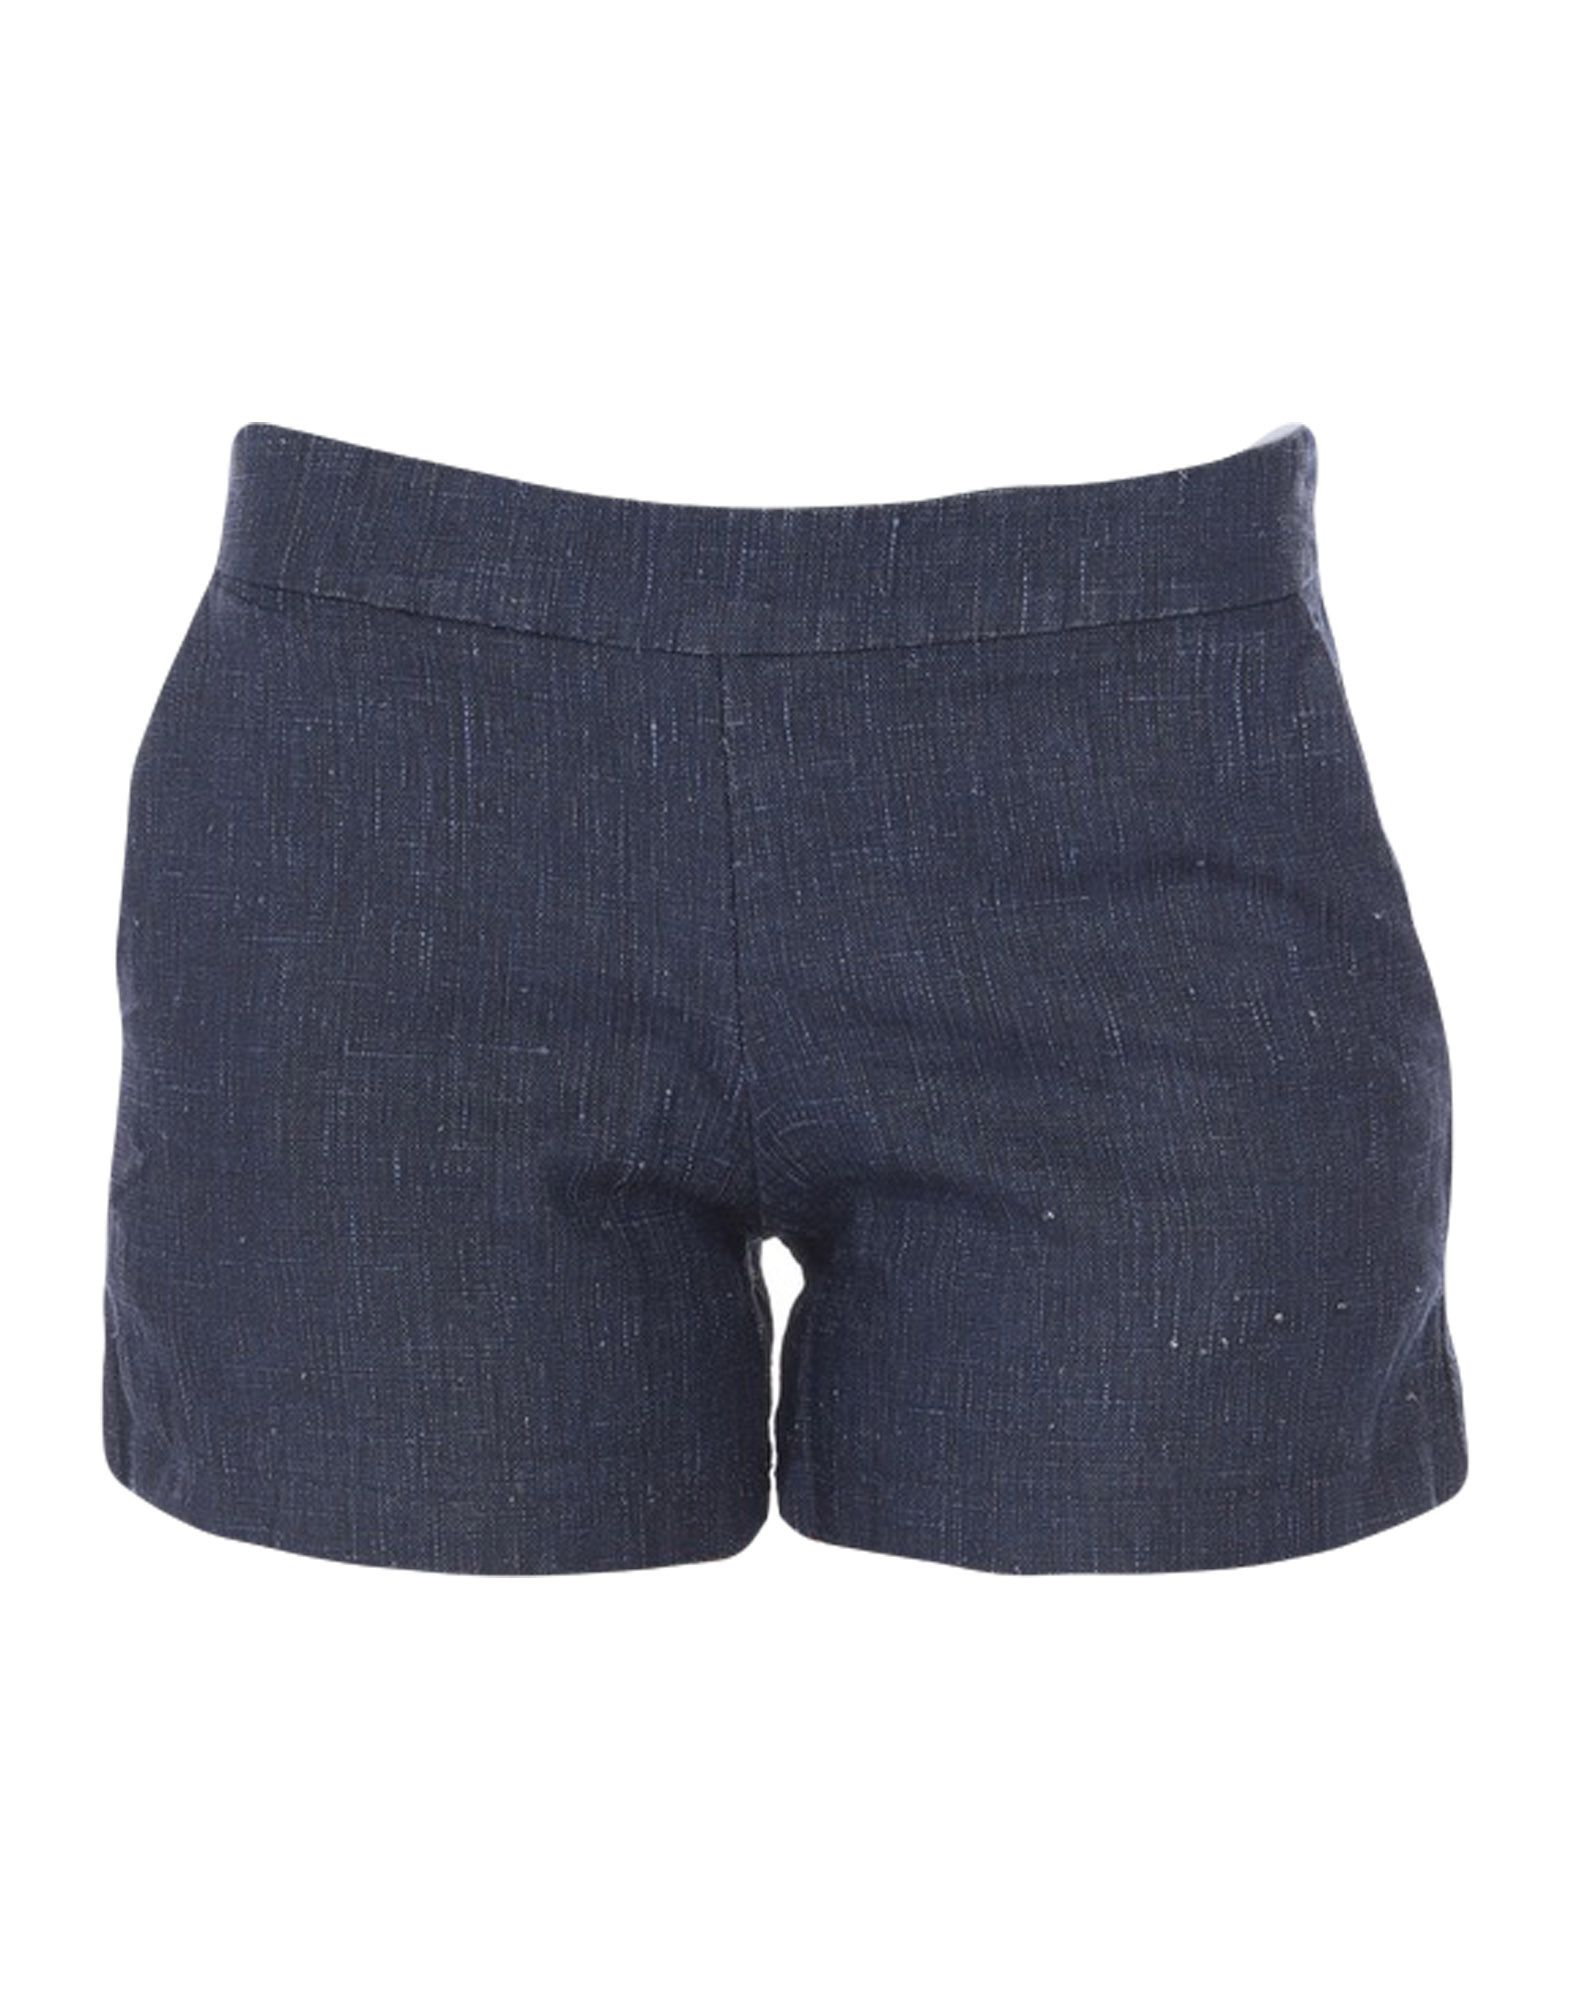 Shorts & & Bermuda Majestic Filatures donna - 13264545RD  kreative Produkte